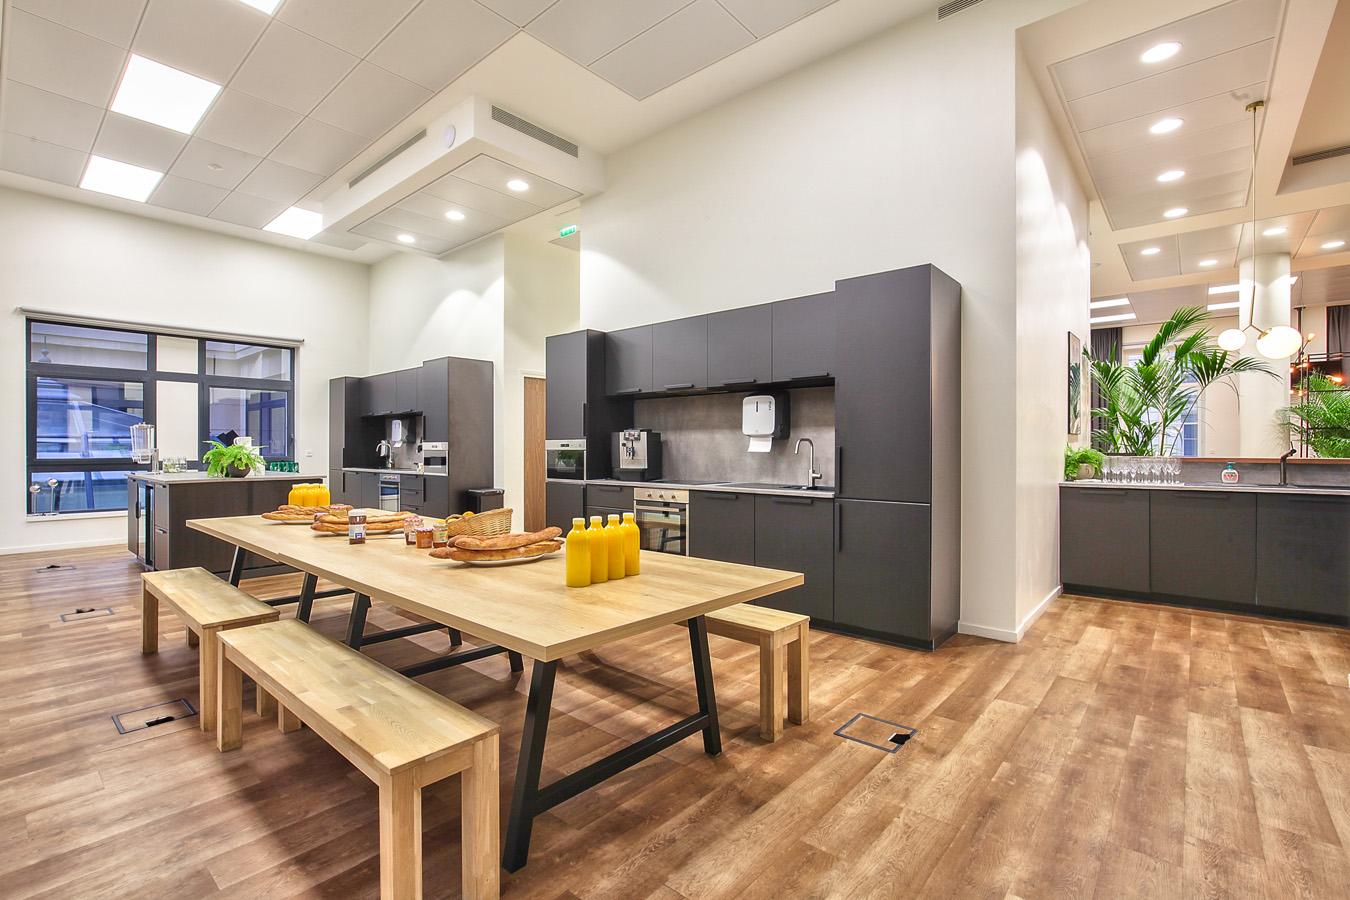 nicolas vade - architecture interieur - bureaux design - Aircall - Cuisine 1.jpg